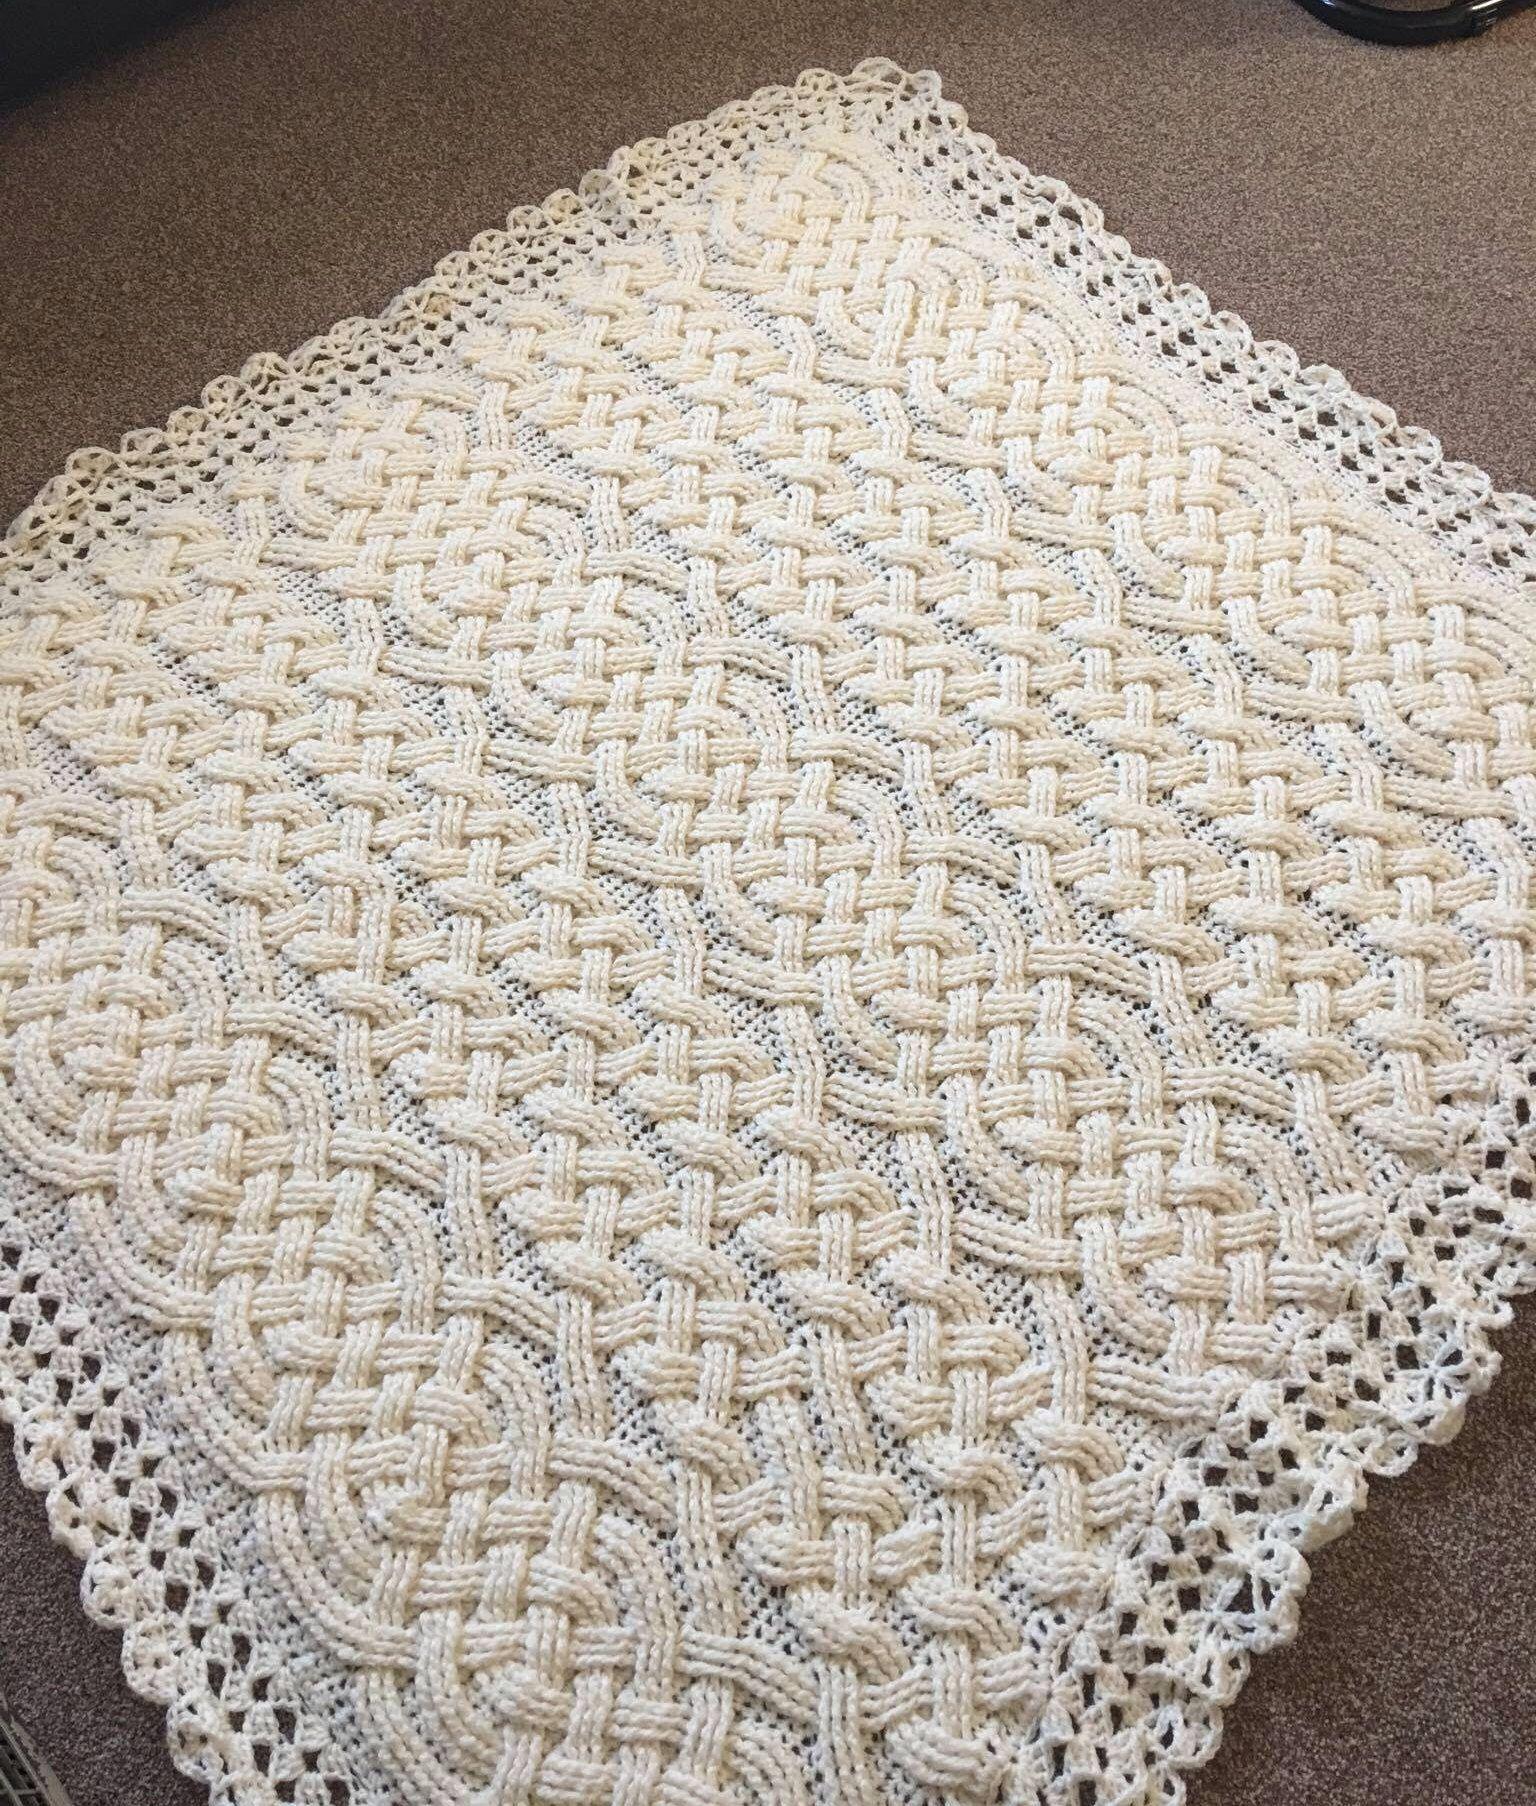 Crochet Blanket Pattern, Stonehaven Braided Cable Aran Blanket ...